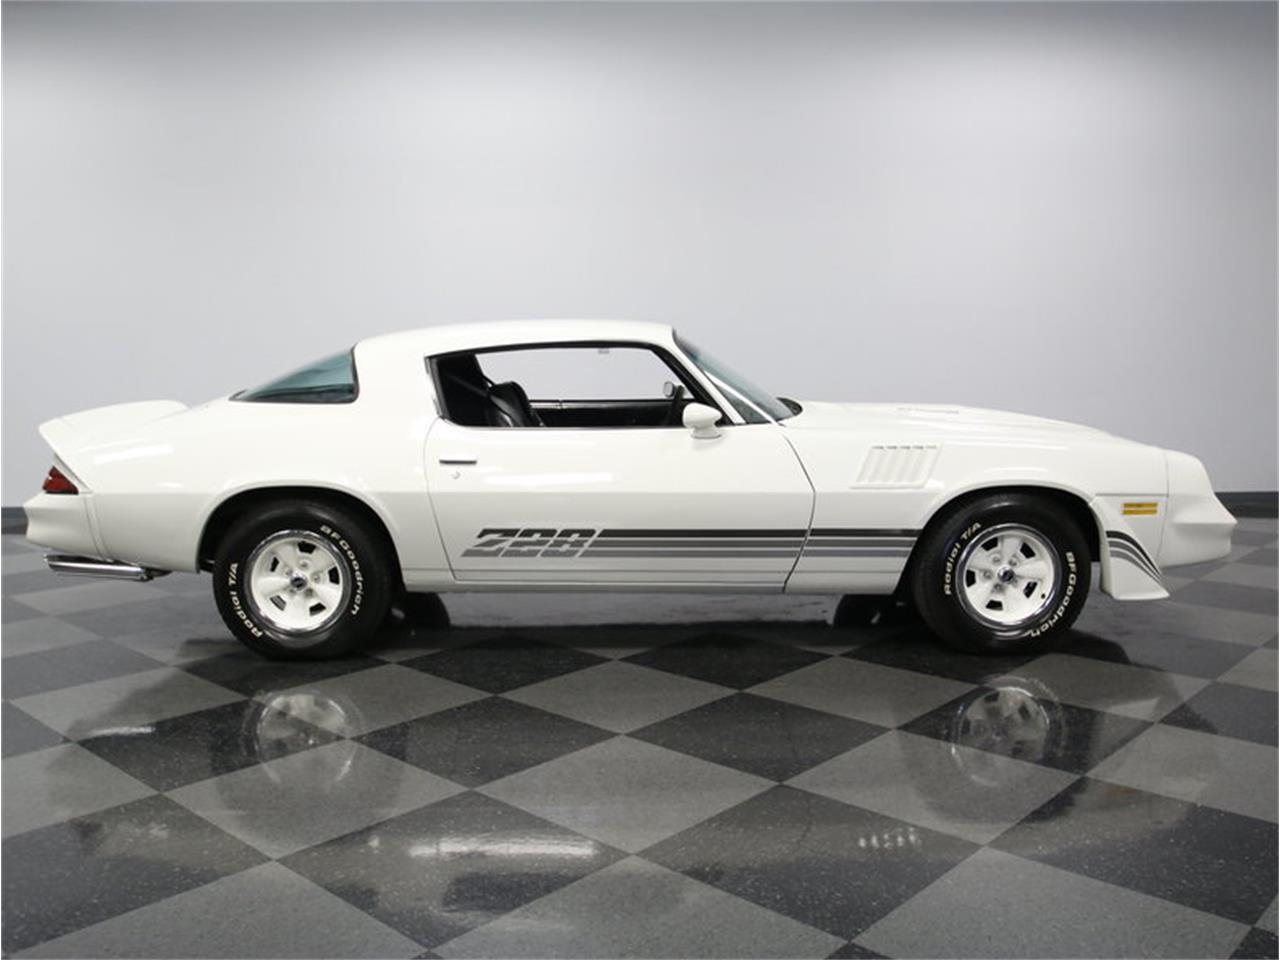 Large Picture of 1978 Chevrolet Camaro Z28 located in Concord North Carolina - $16,995.00 - L5M0